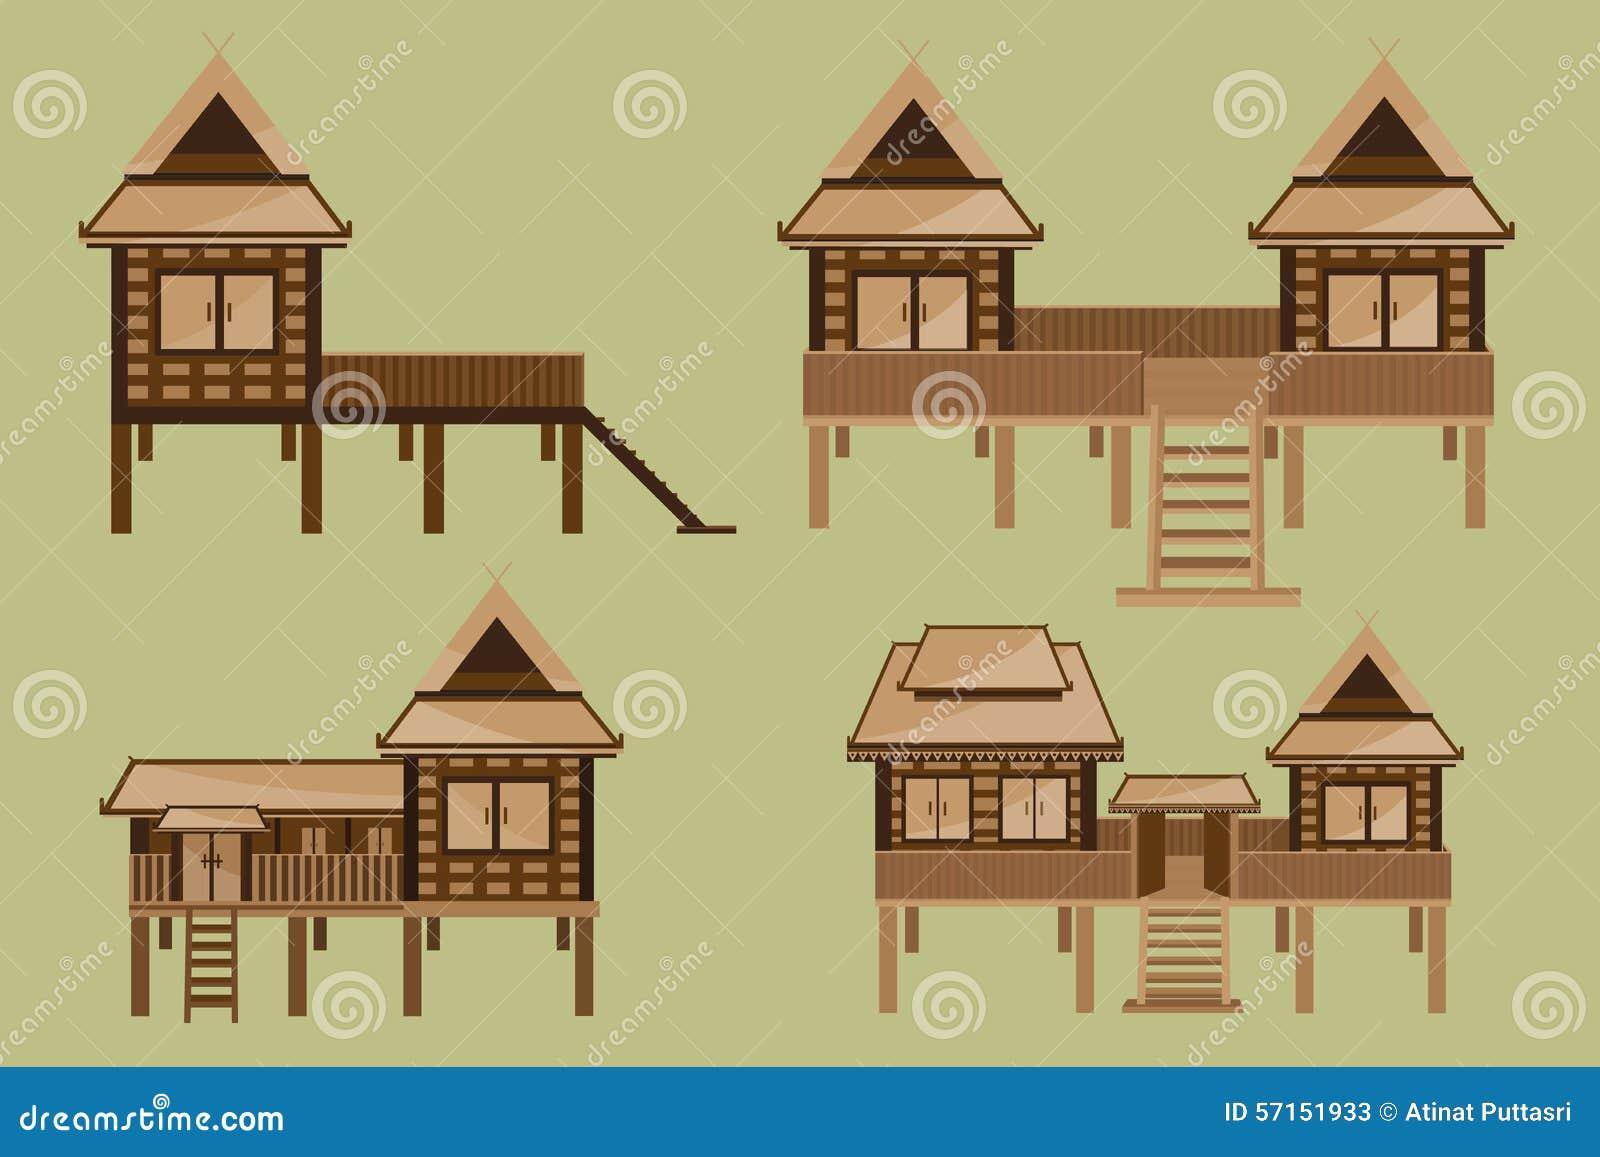 Thai house design stock vector image 57151933 for Architecture technique